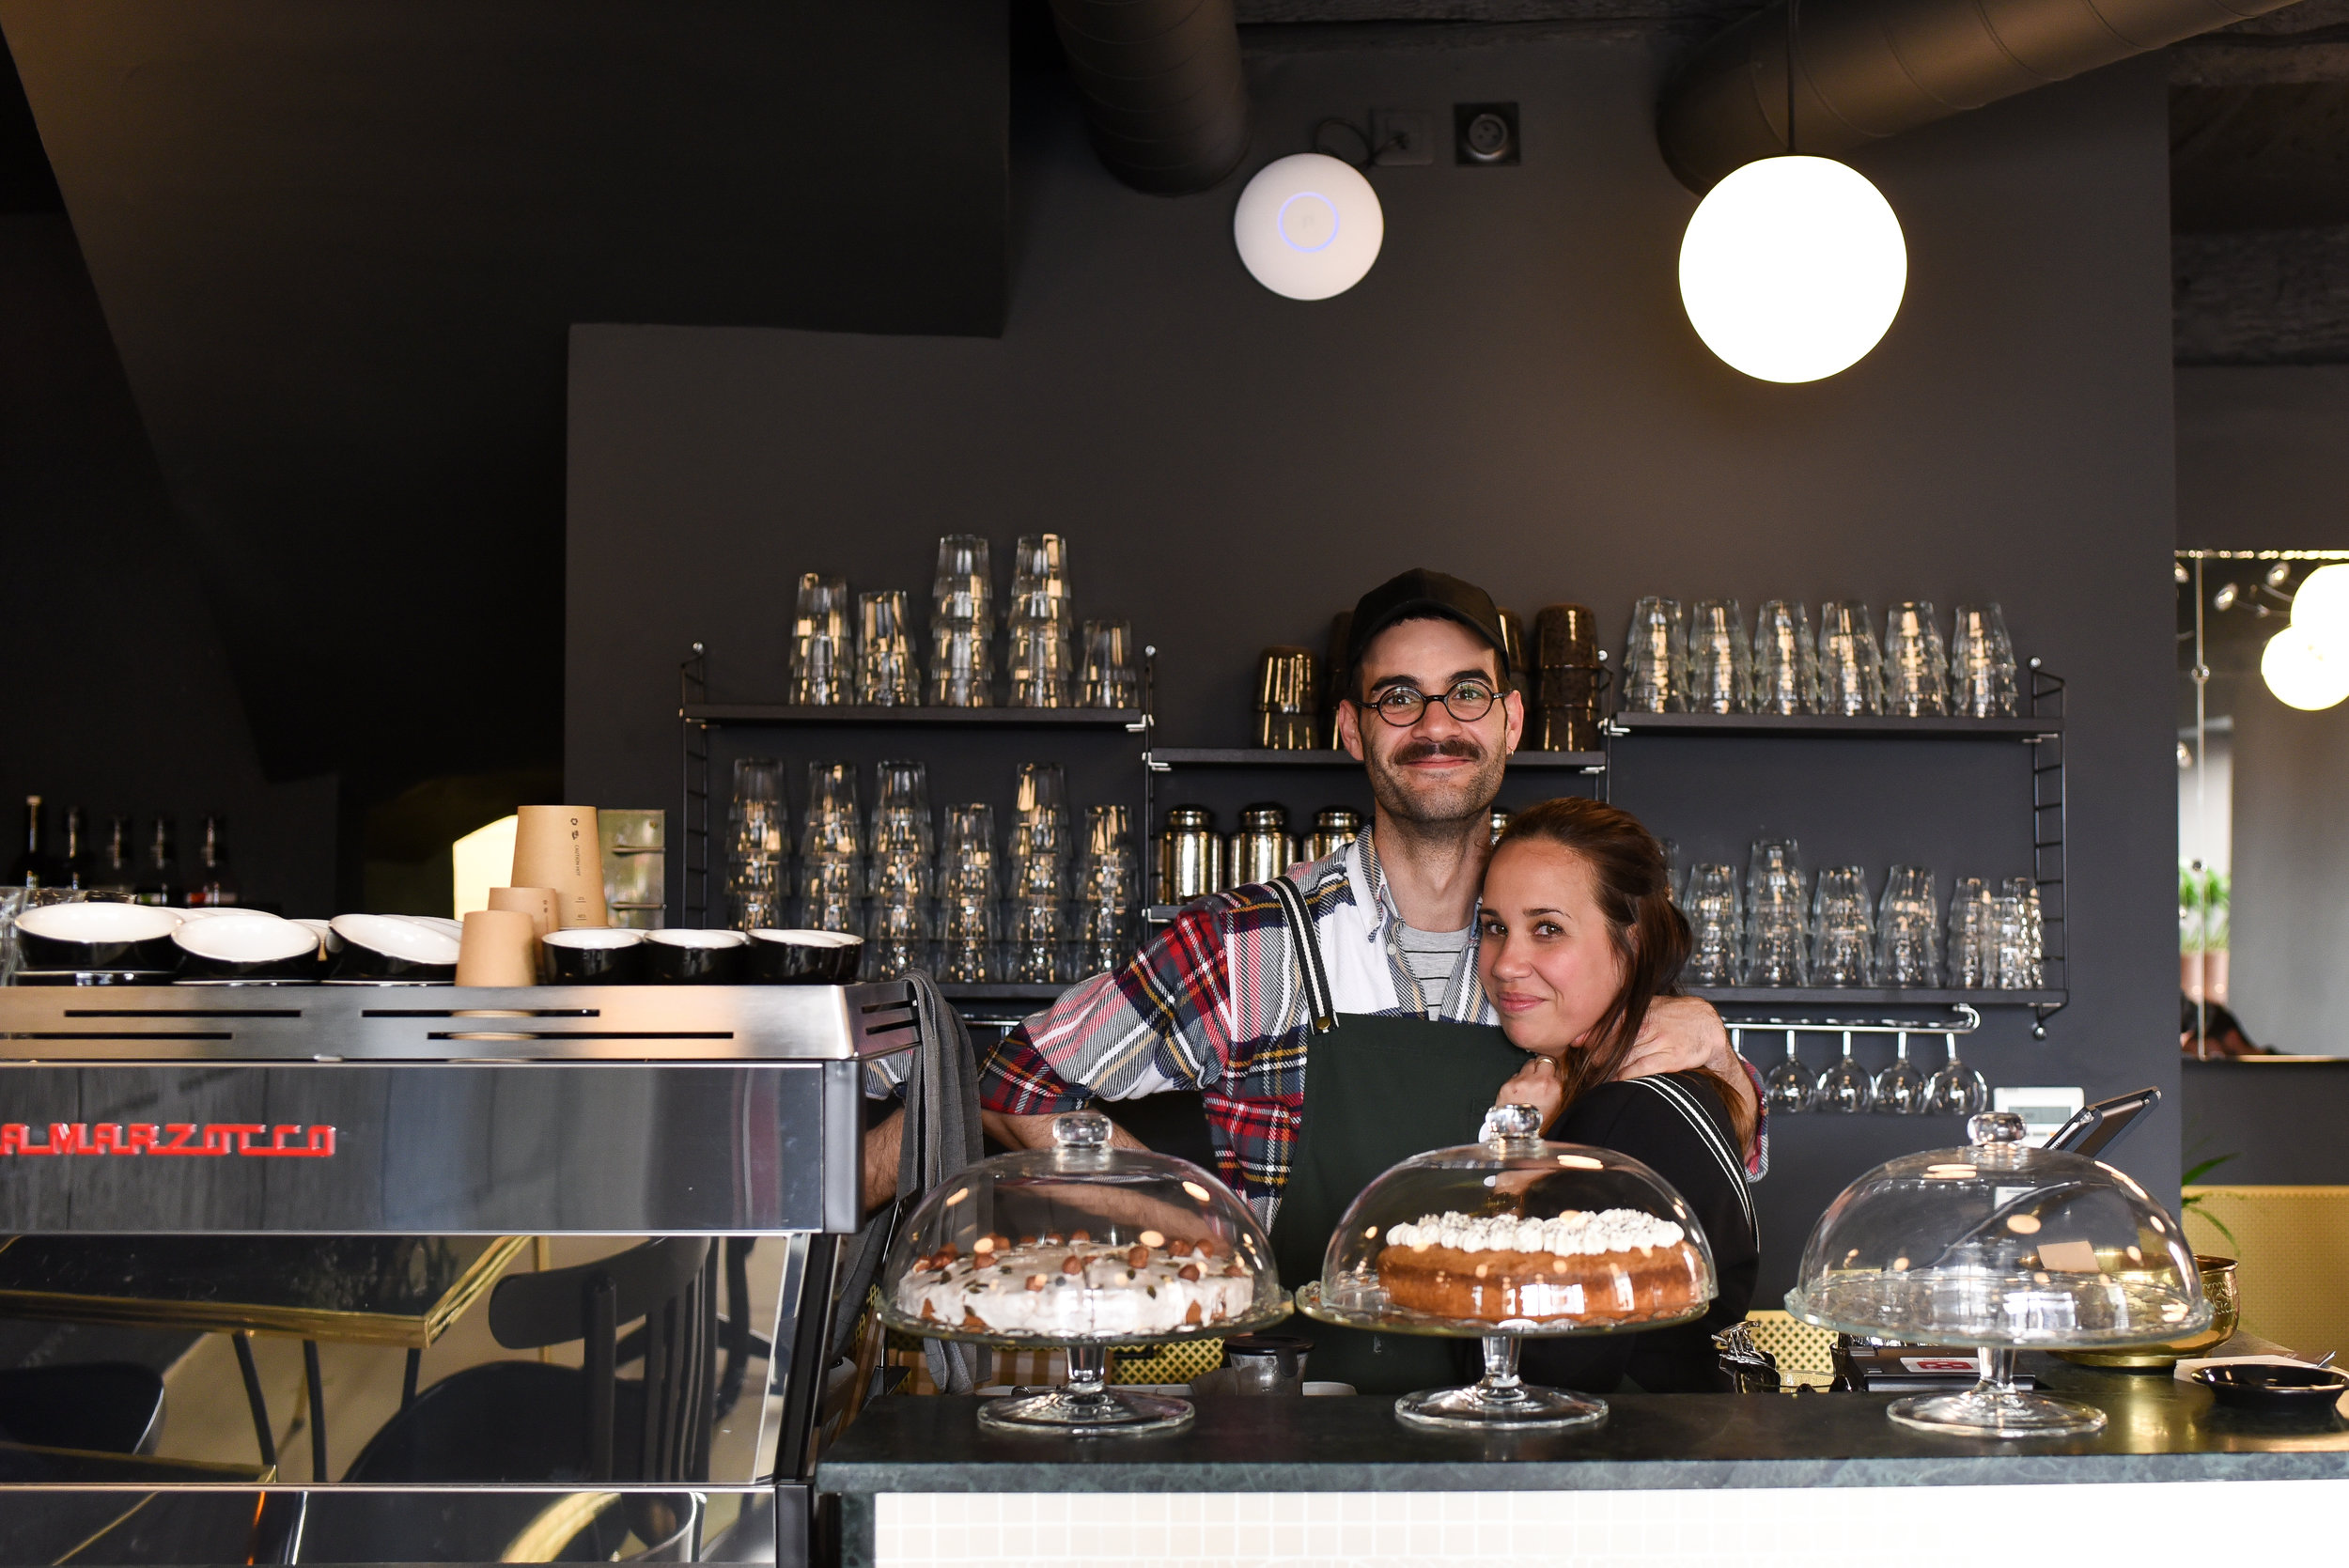 twinky-lizzy-blog-aix-en-provence-cafe-du-temps-restaurant-vegan-17.jpg